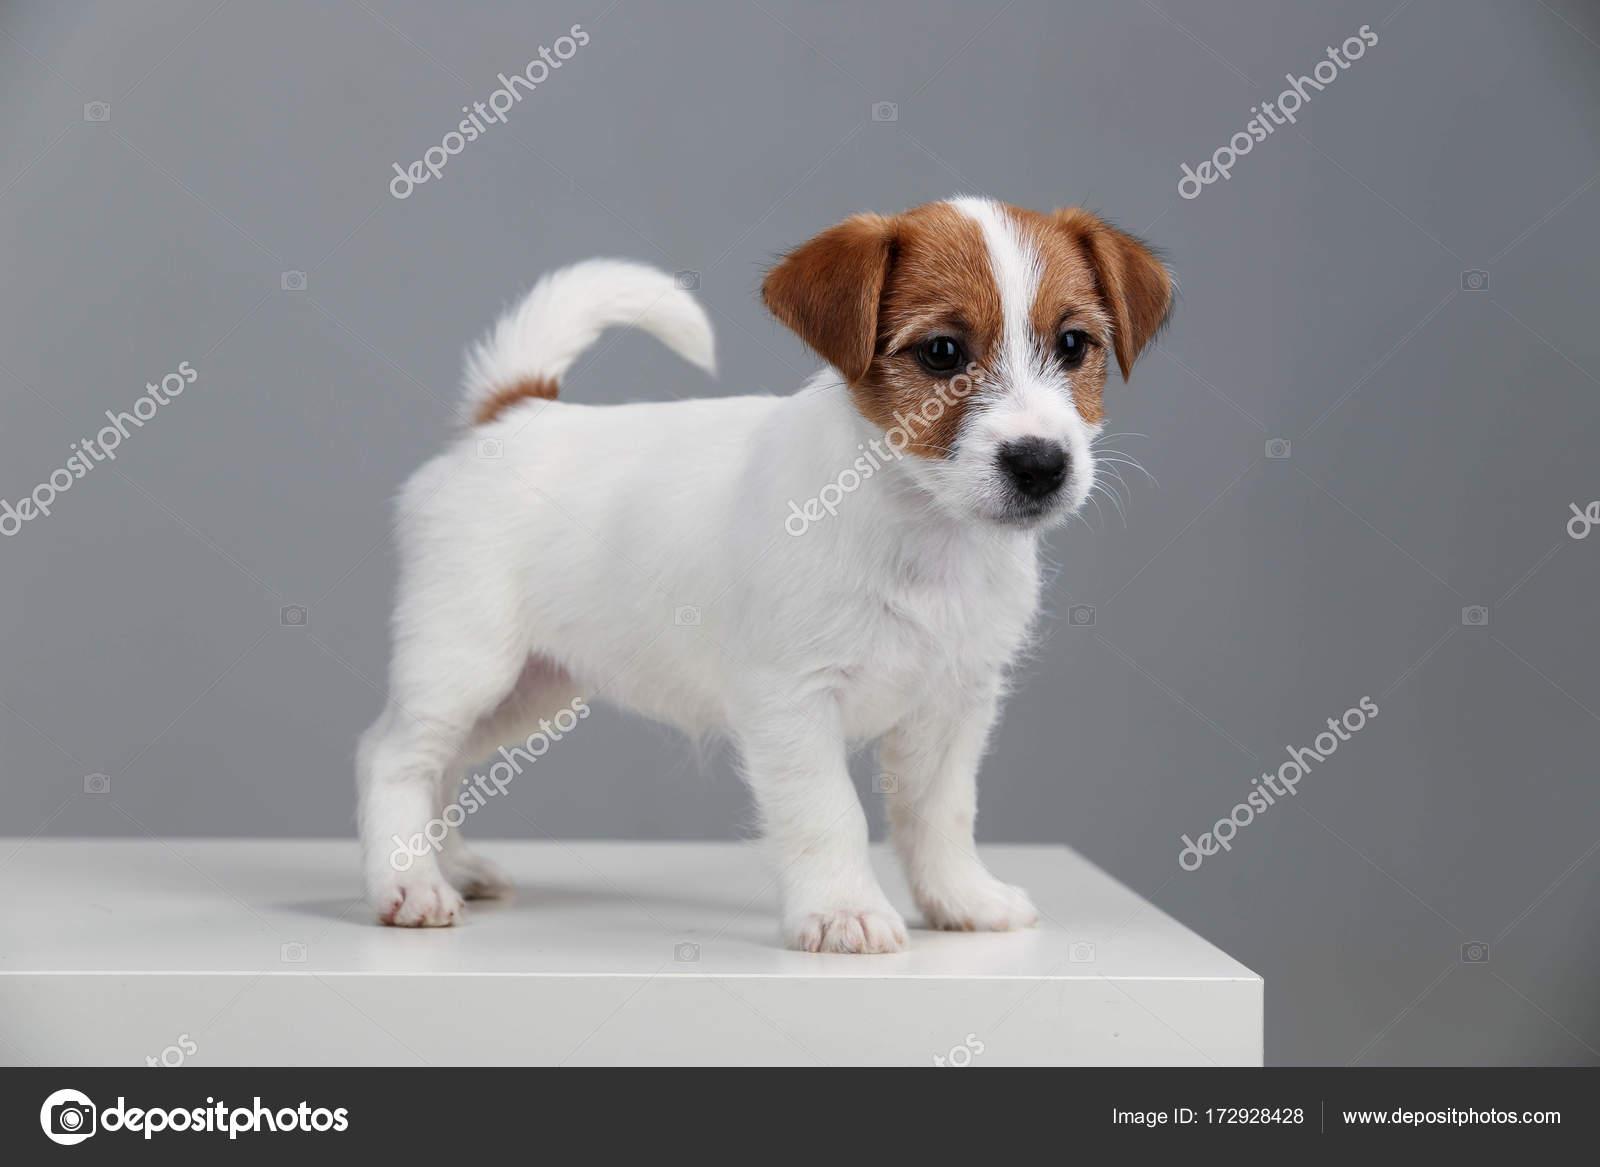 Jack Russell Terrier Baby Close Up Gray Background Stock Photo C Kazanovskyiphoto Gmail Com 172928428